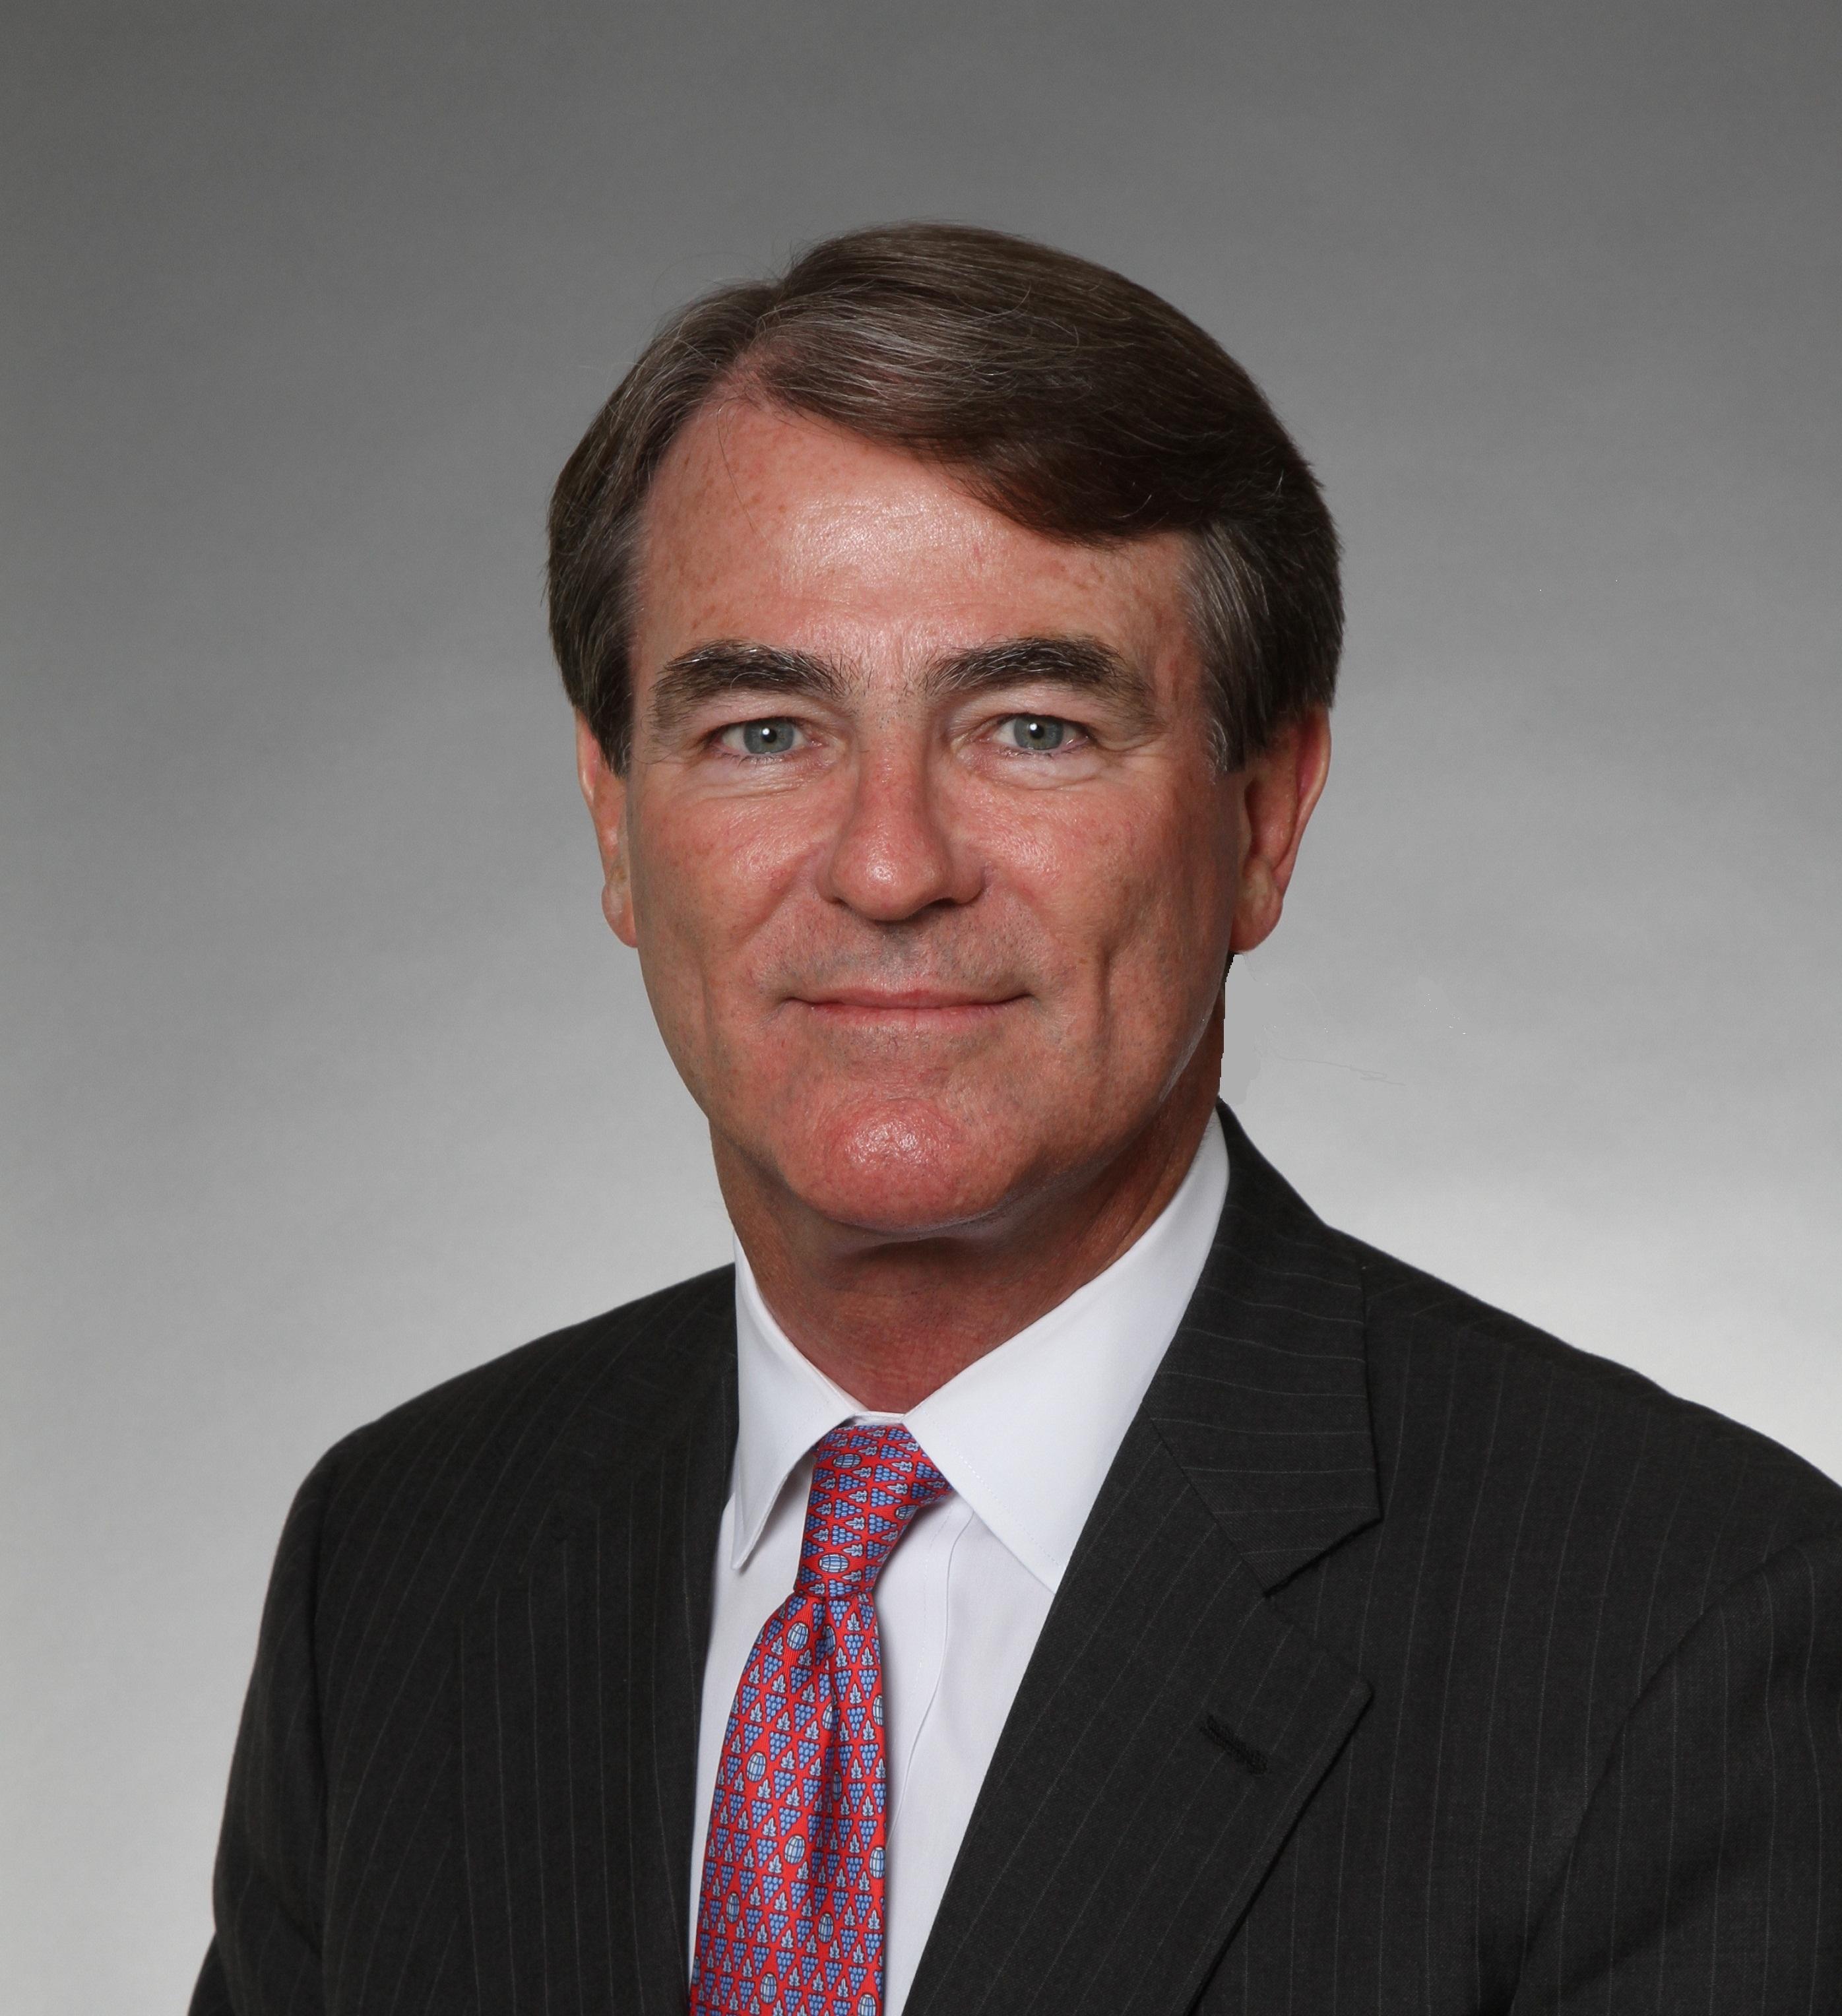 Mr. Joseph M. Matthews